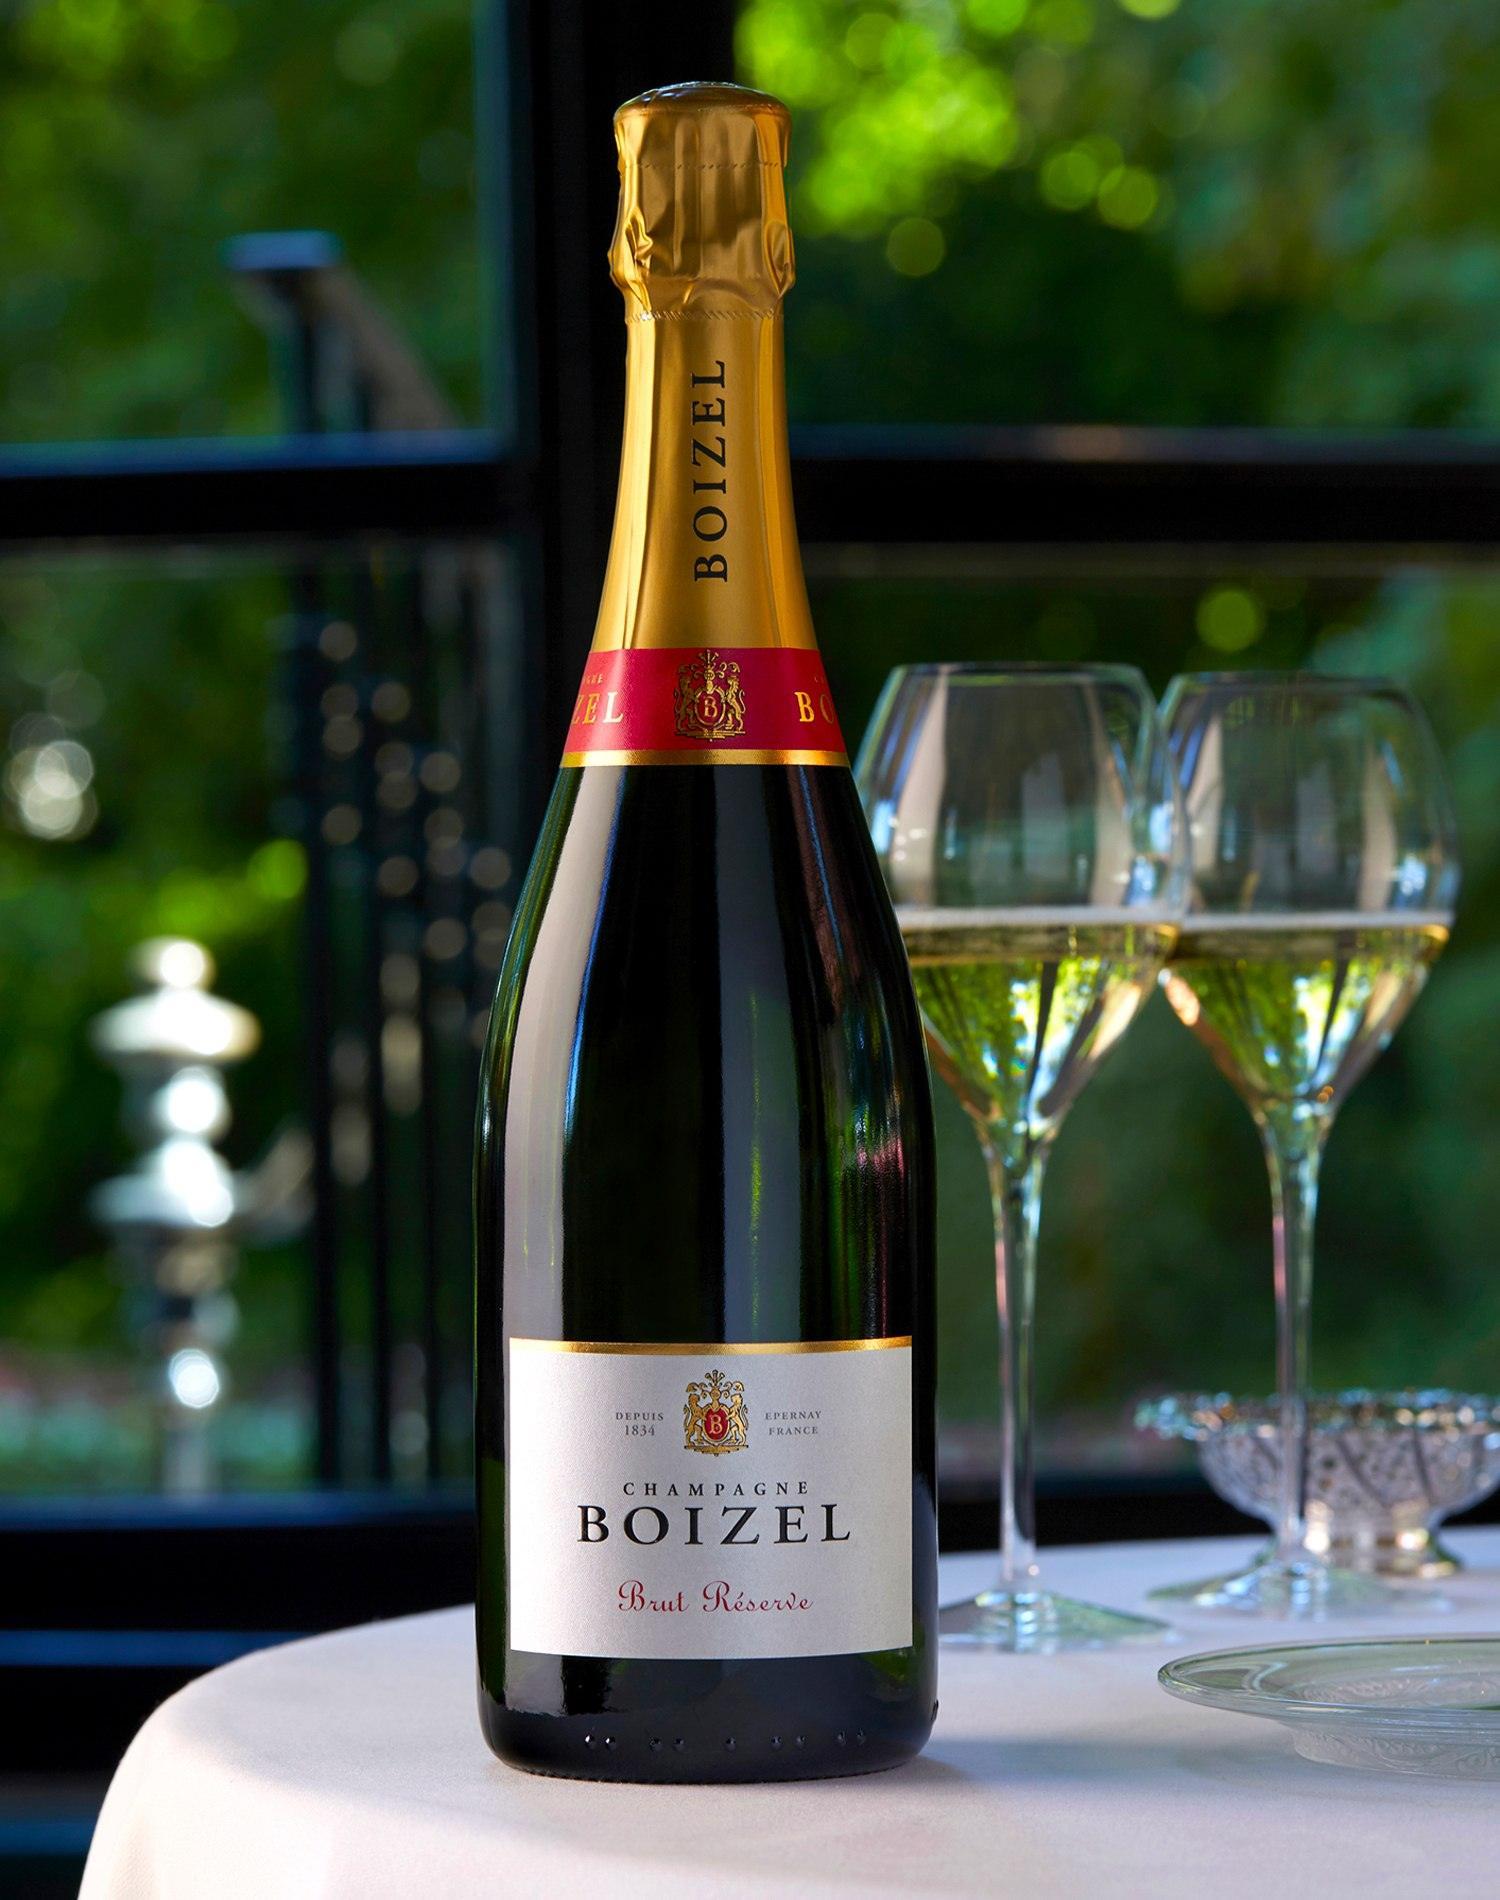 Home - Champagne Boizel - Epernay France